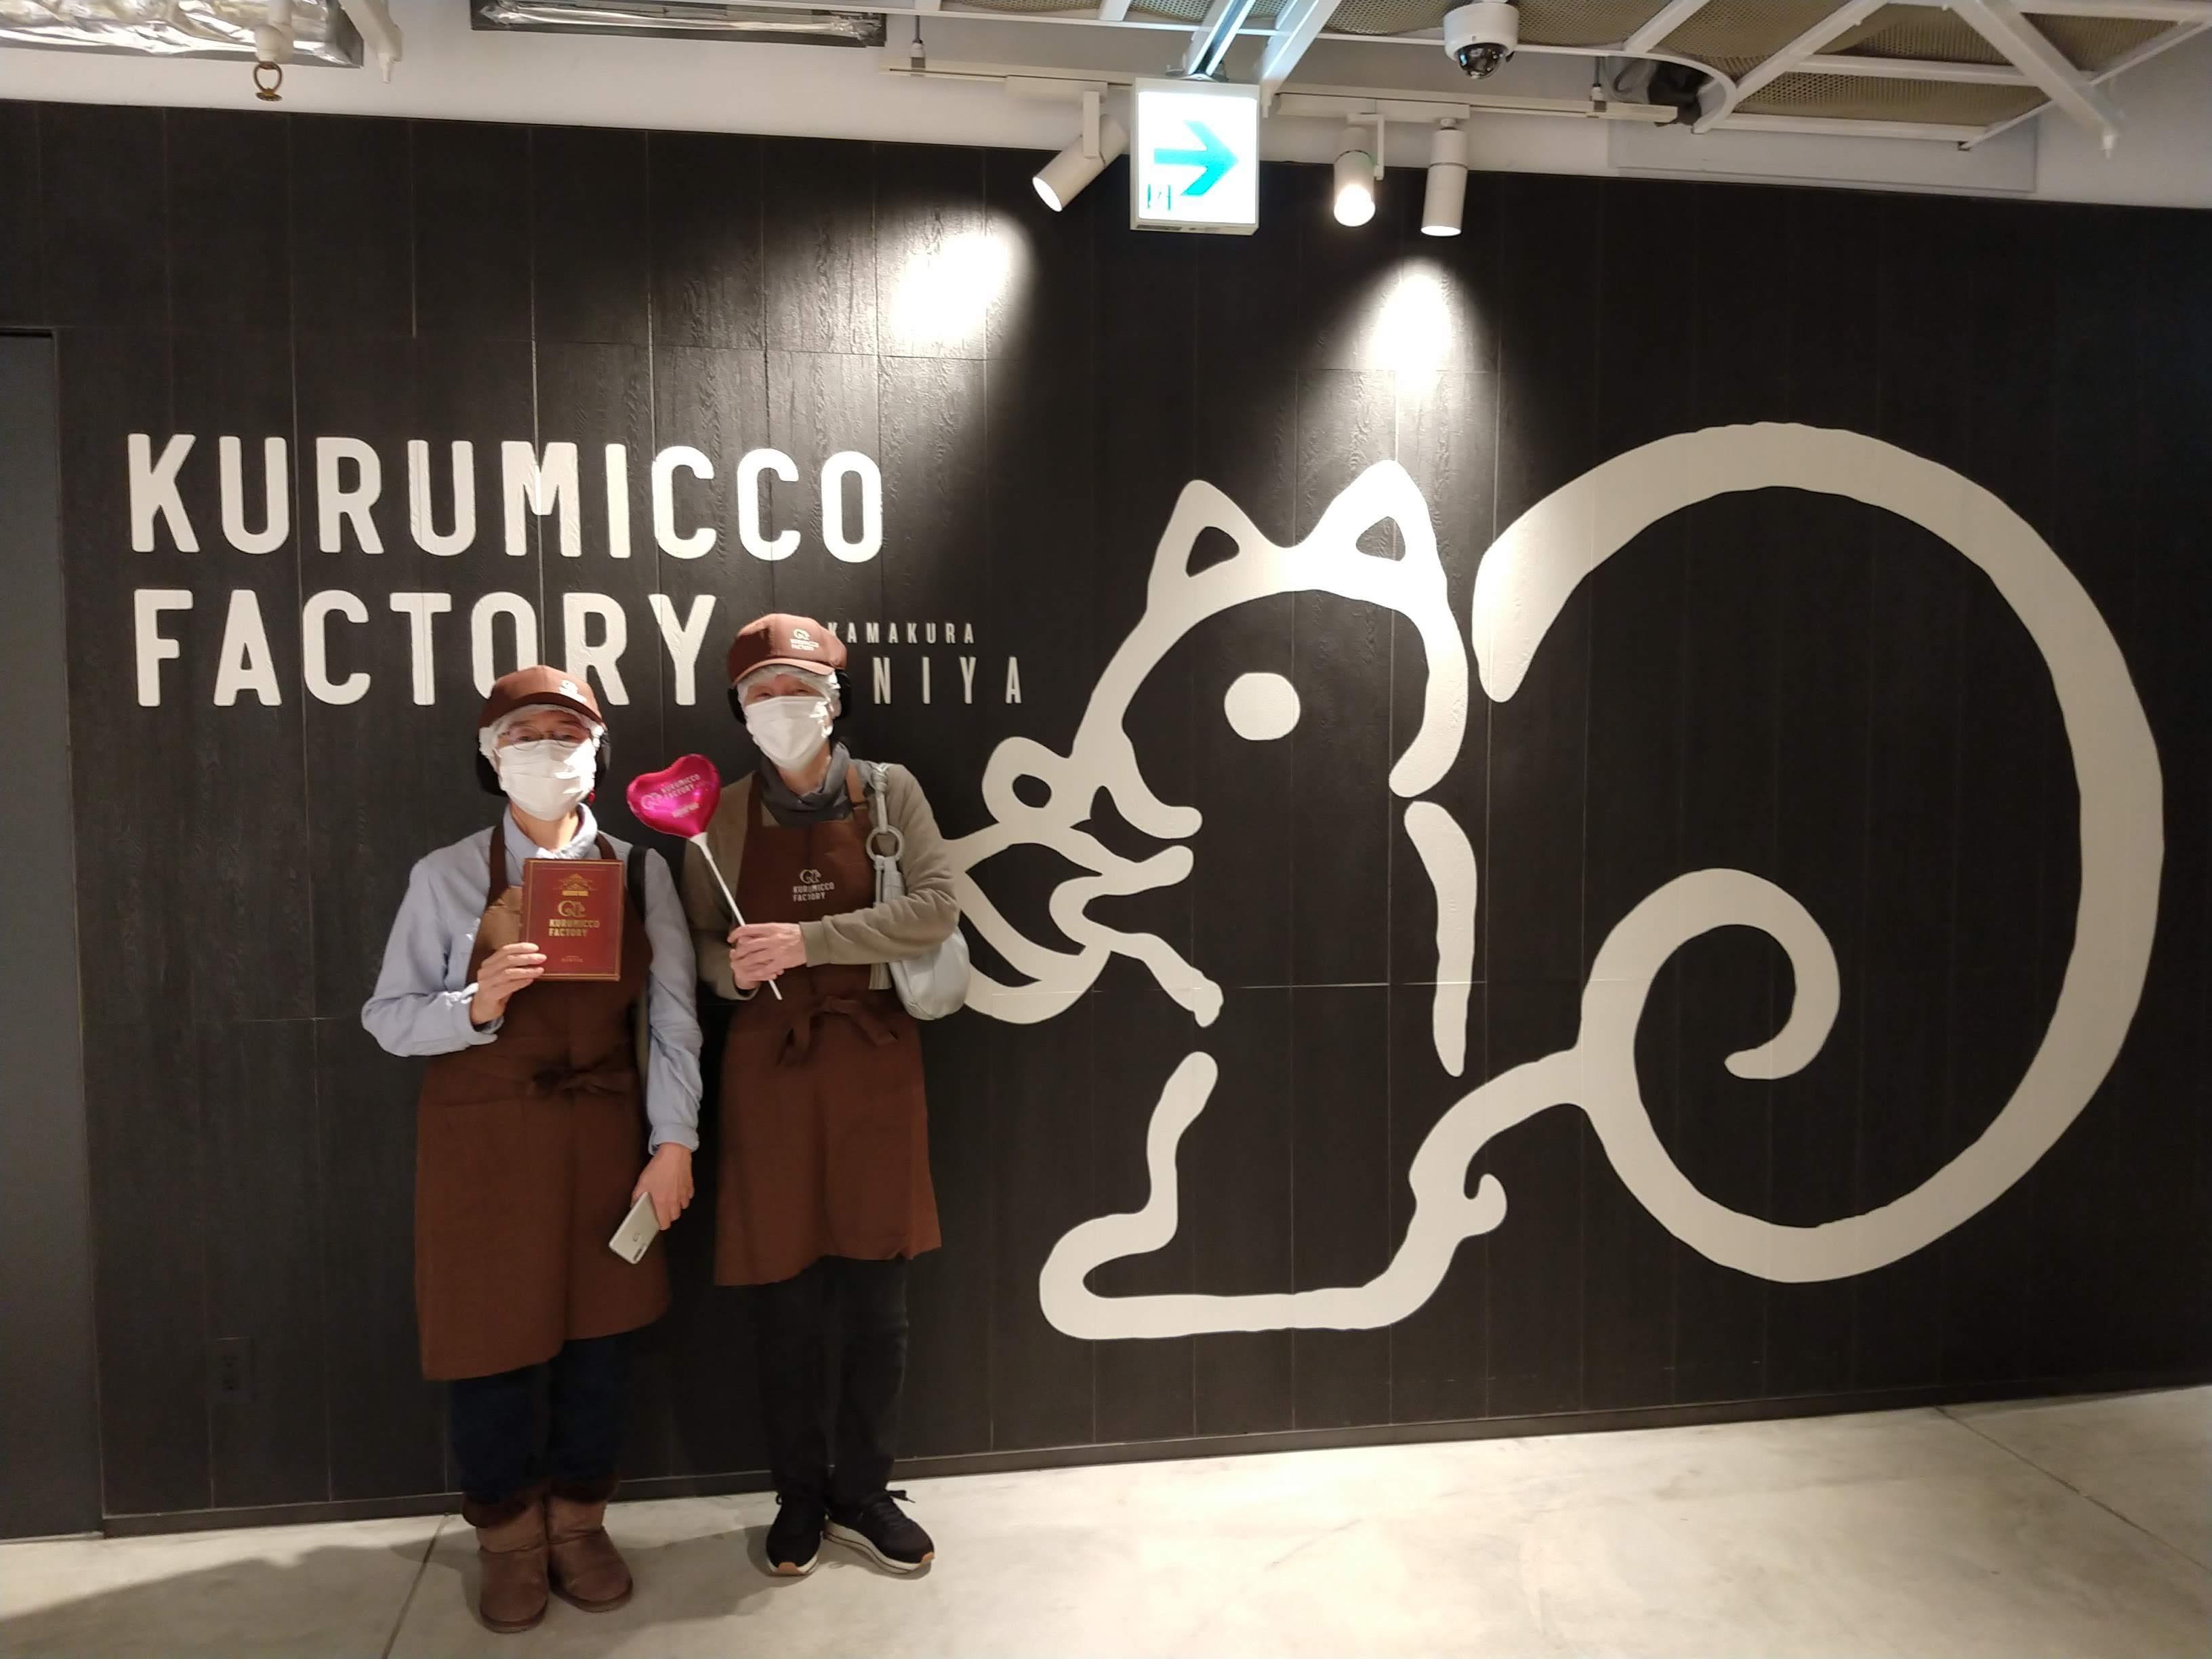 Kurumicco Factory ワークショップ_a0057402_05303940.jpg